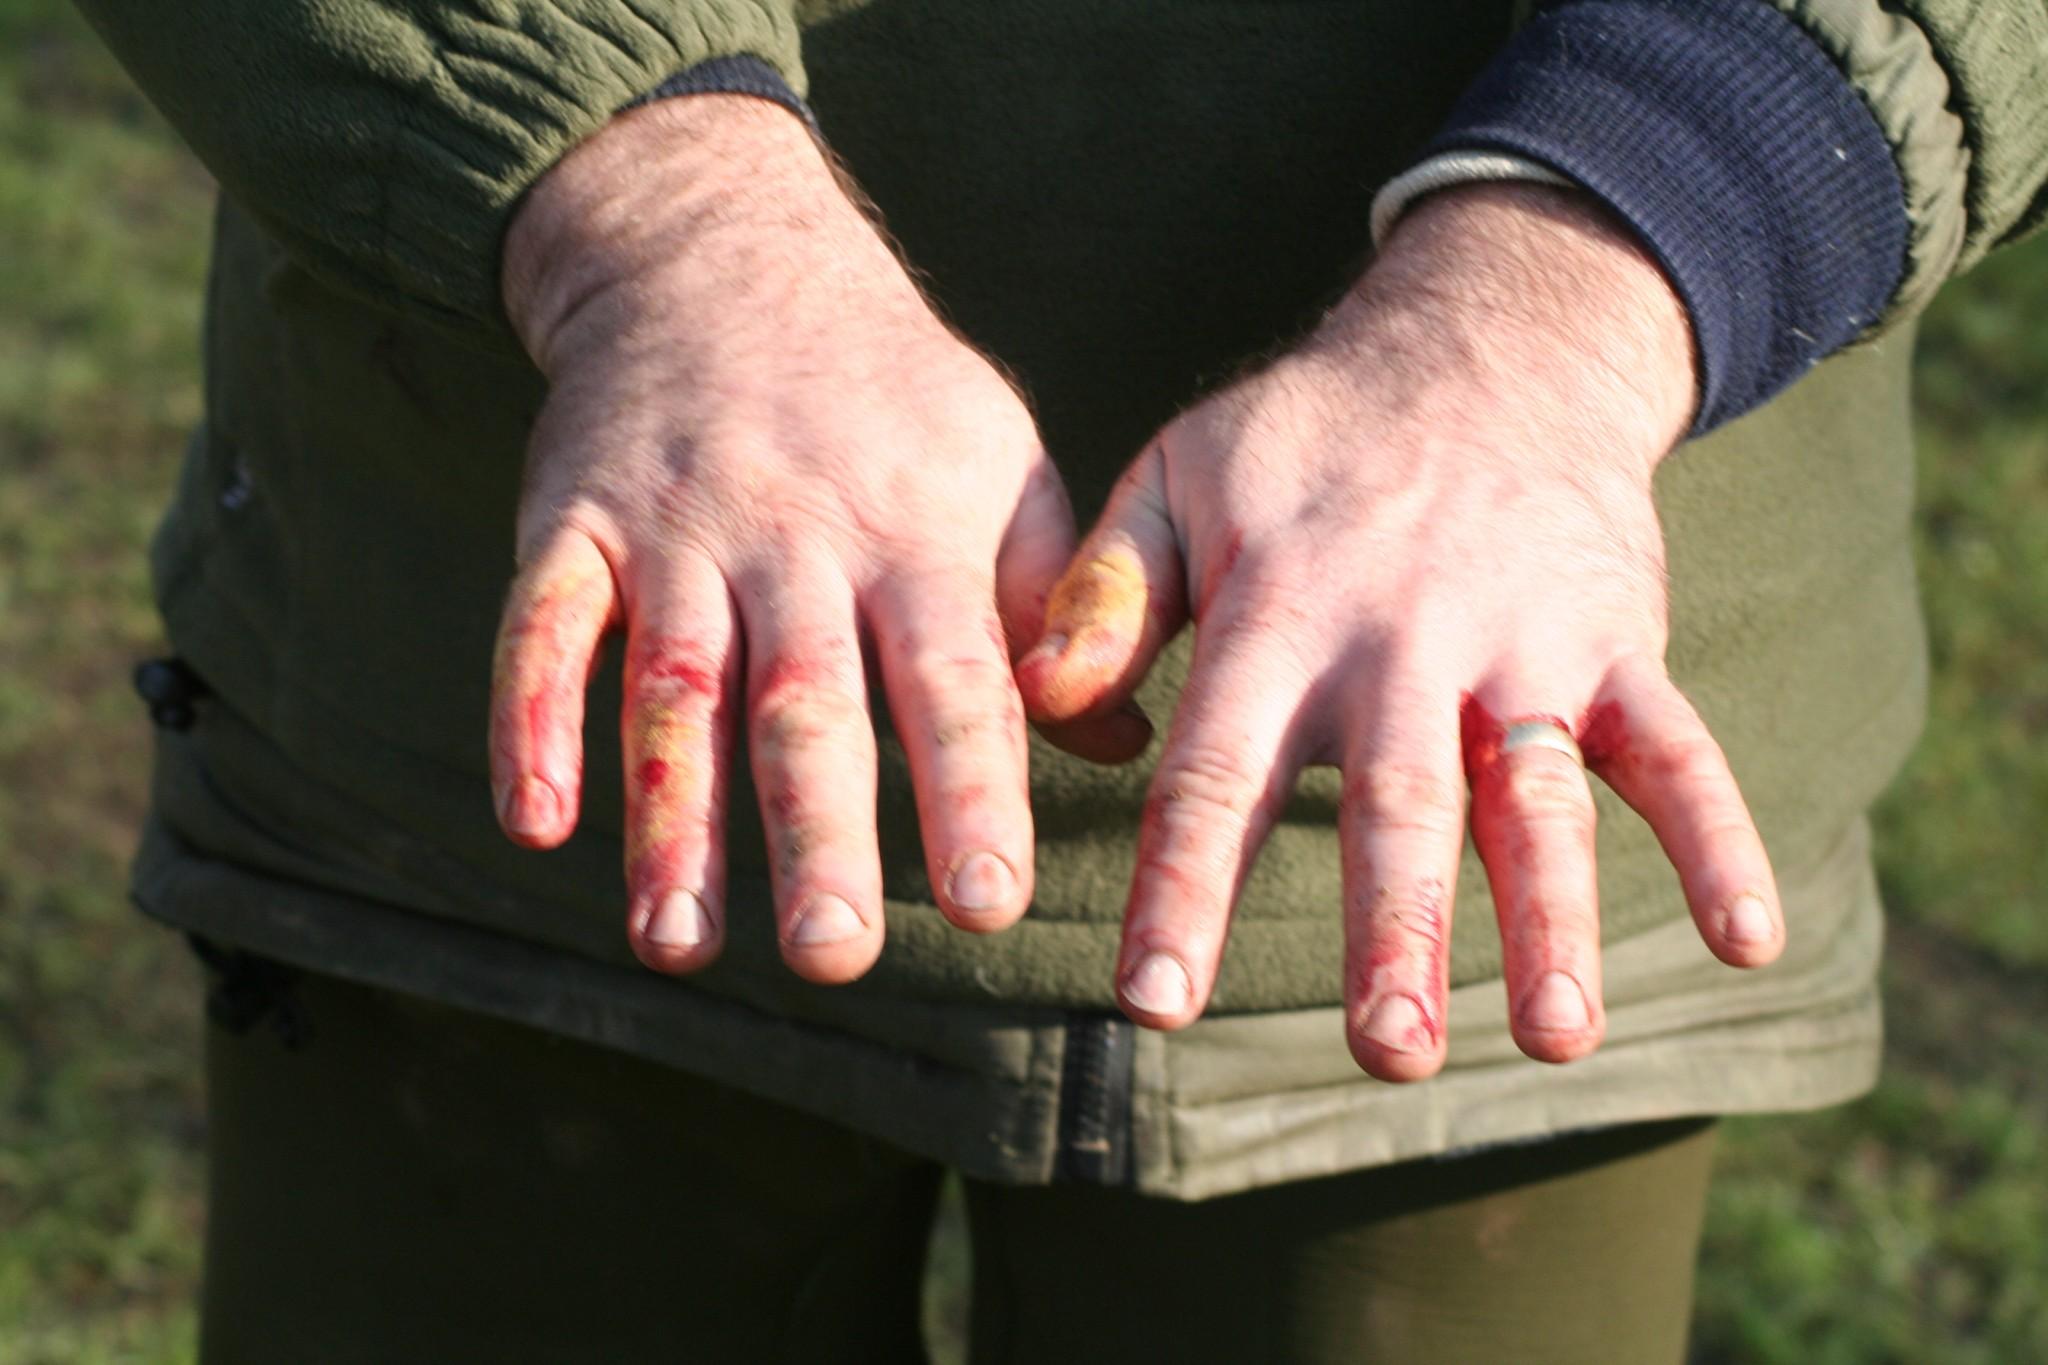 Lampreys attack humans